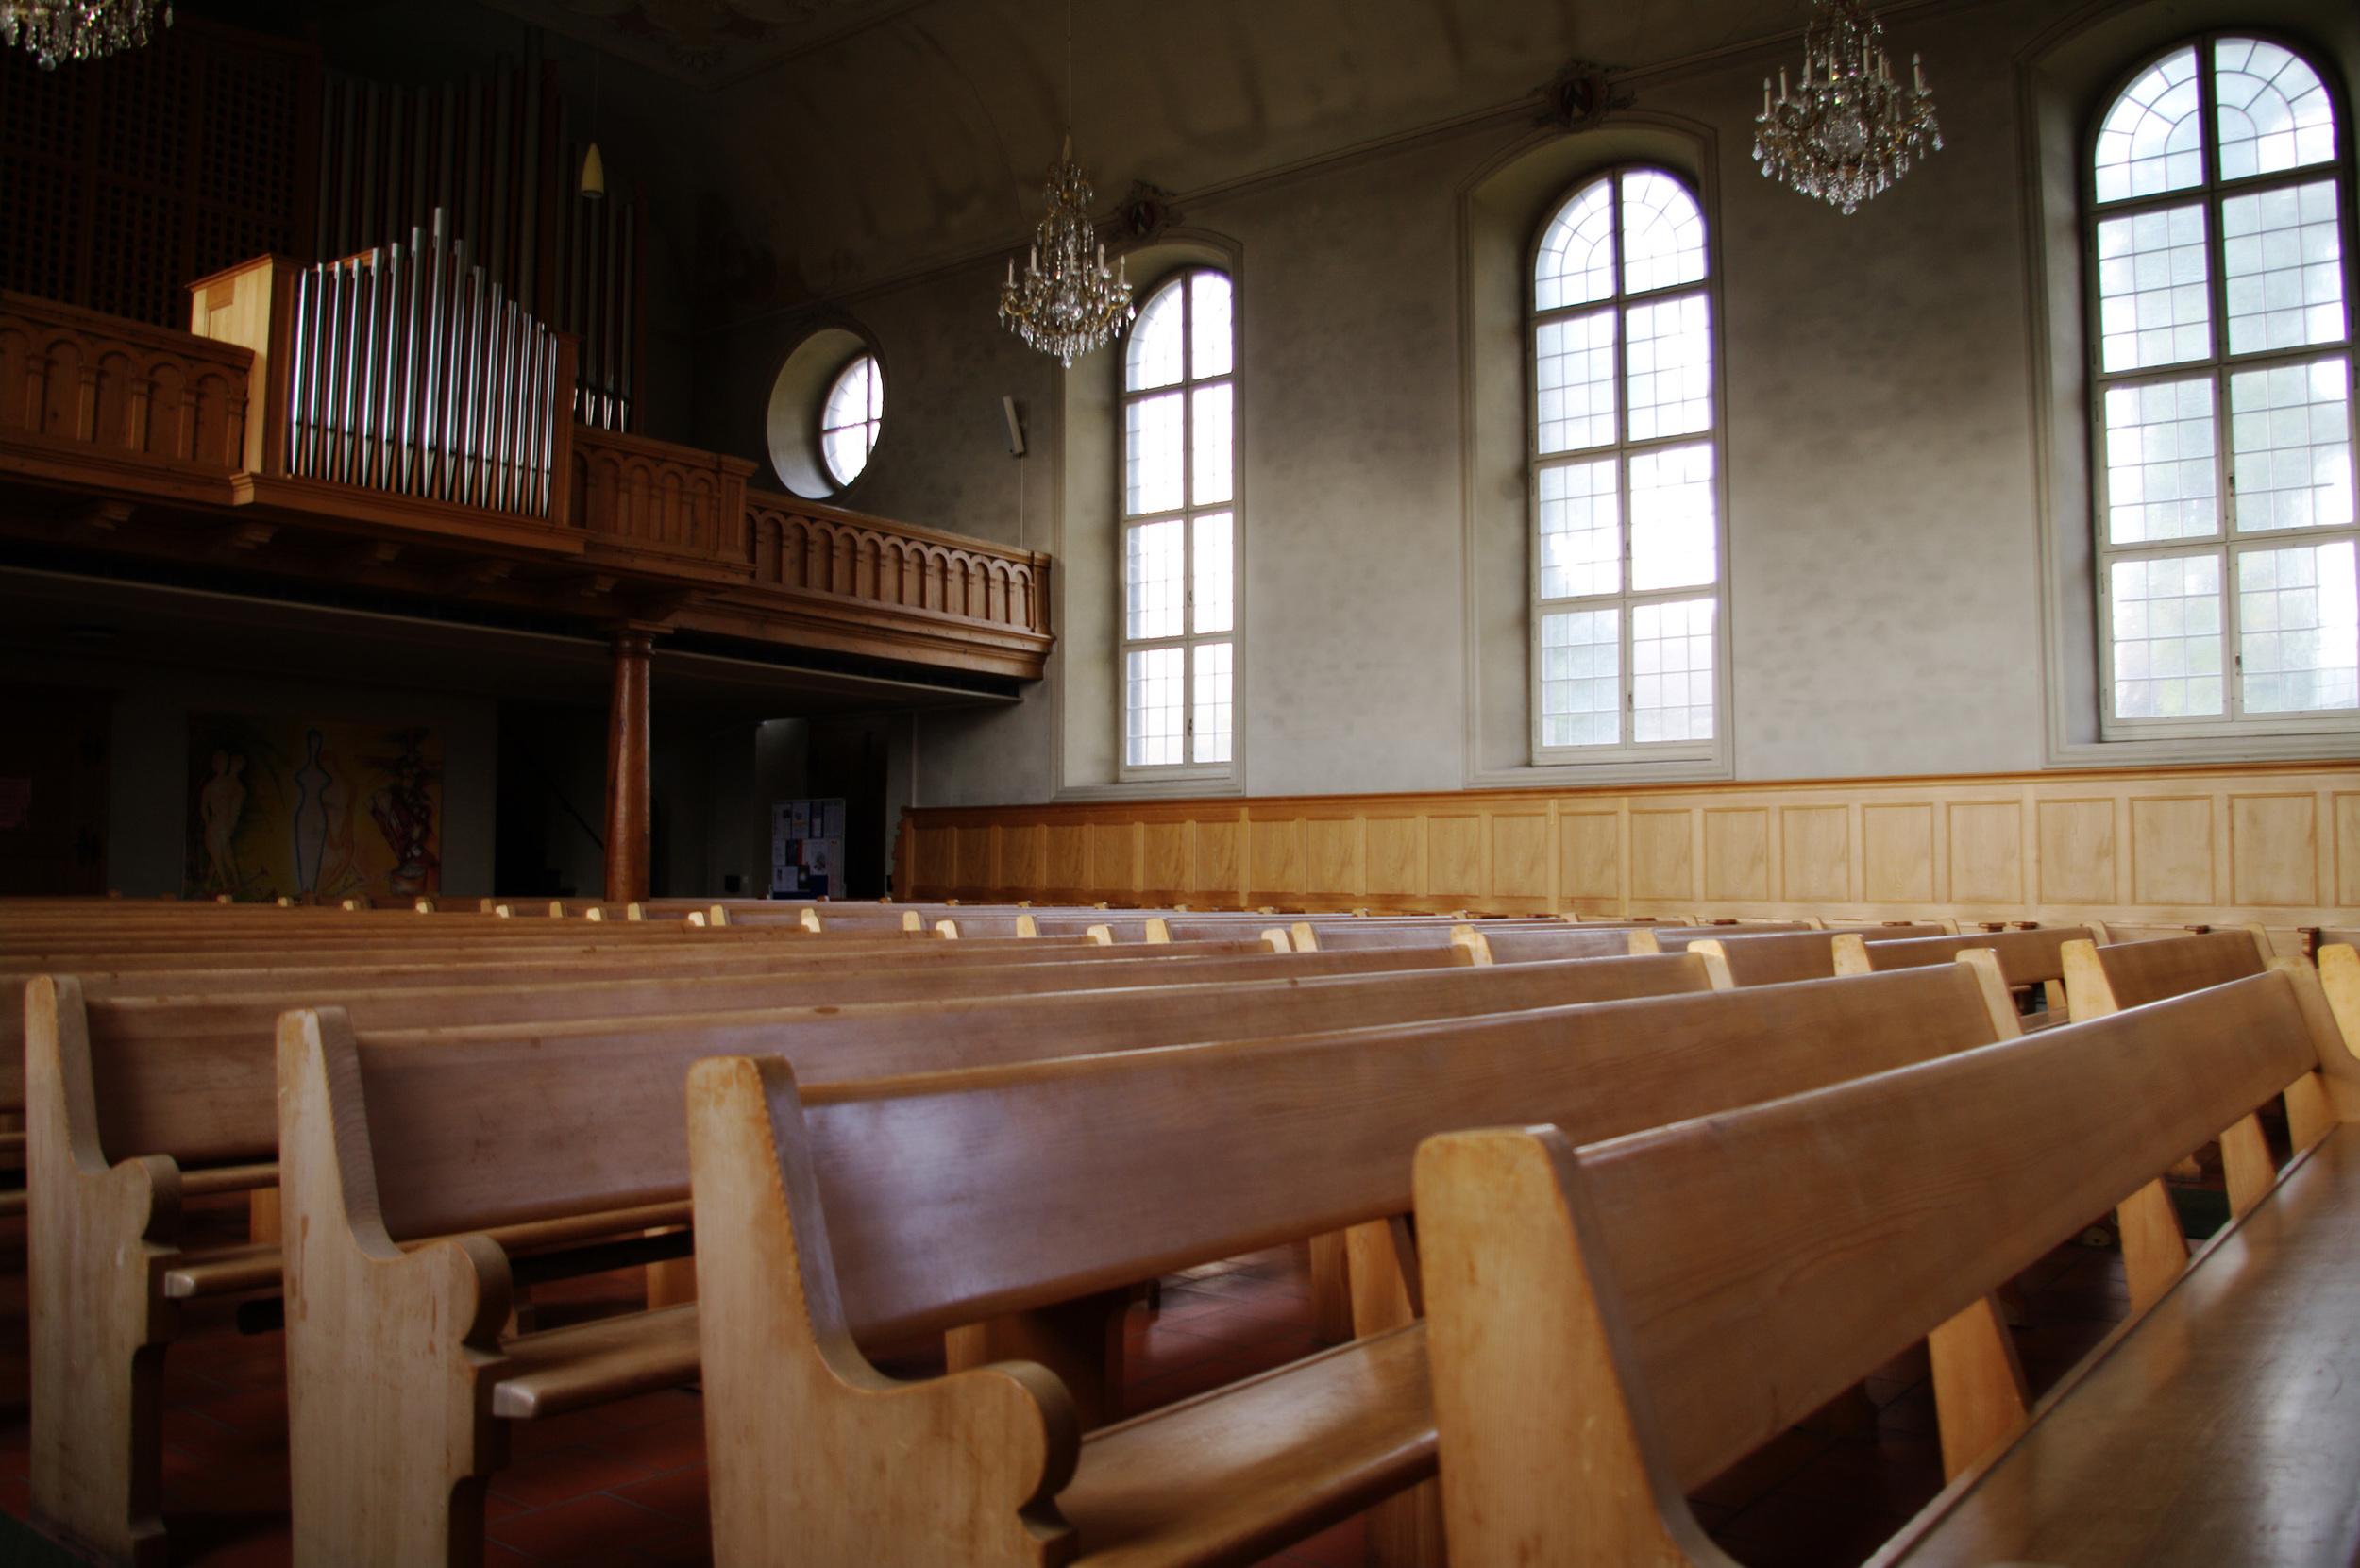 stockvault-church-benches114251.jpg